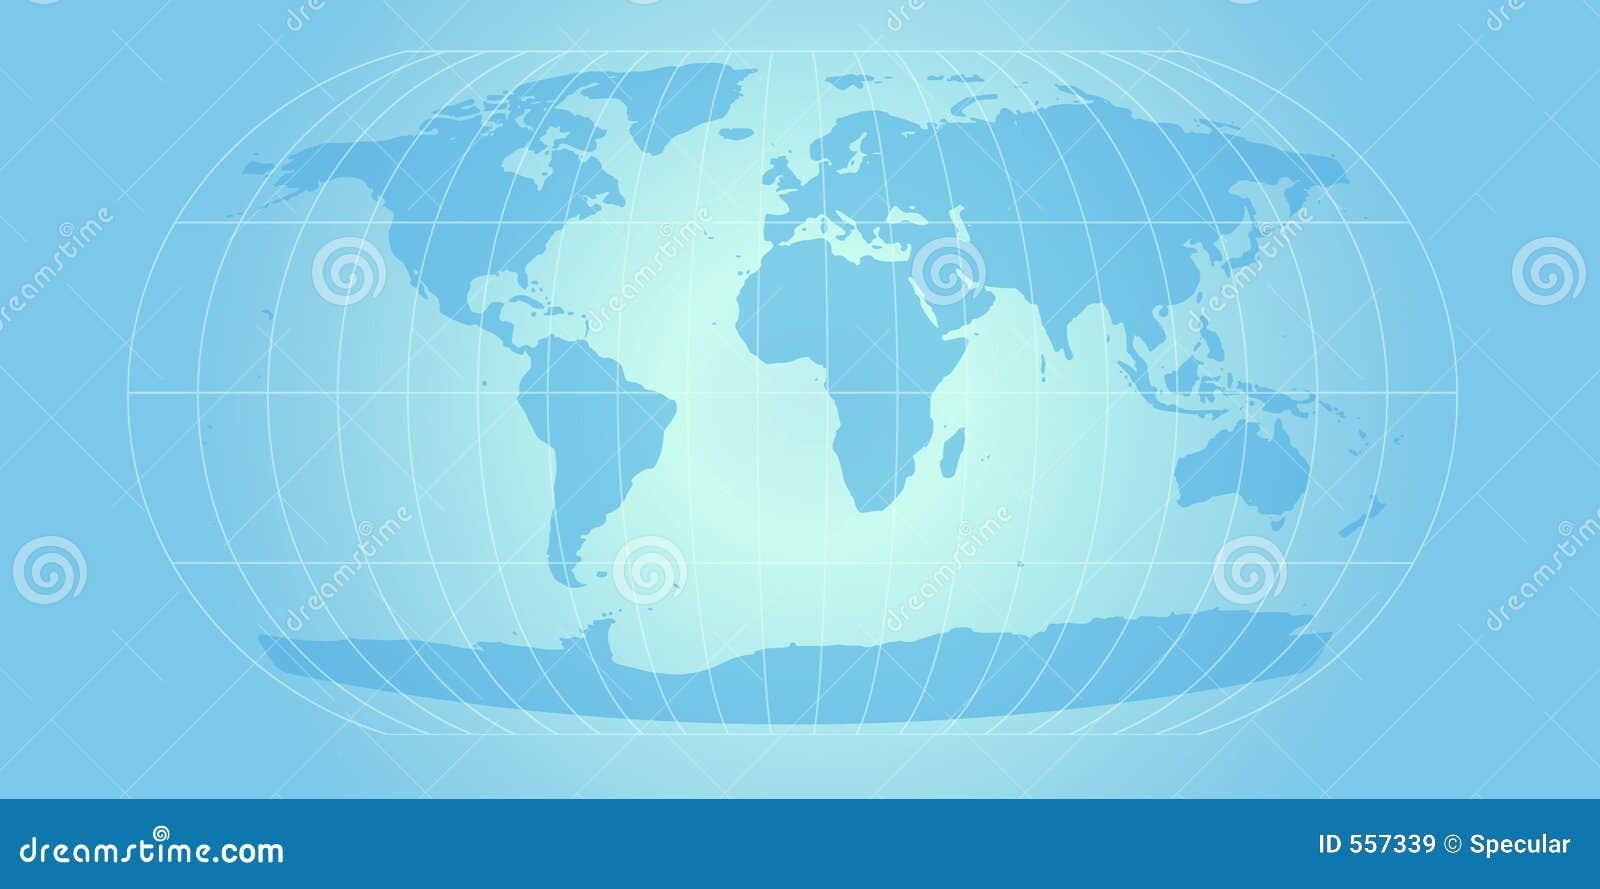 Himmelblau-Weltkarte